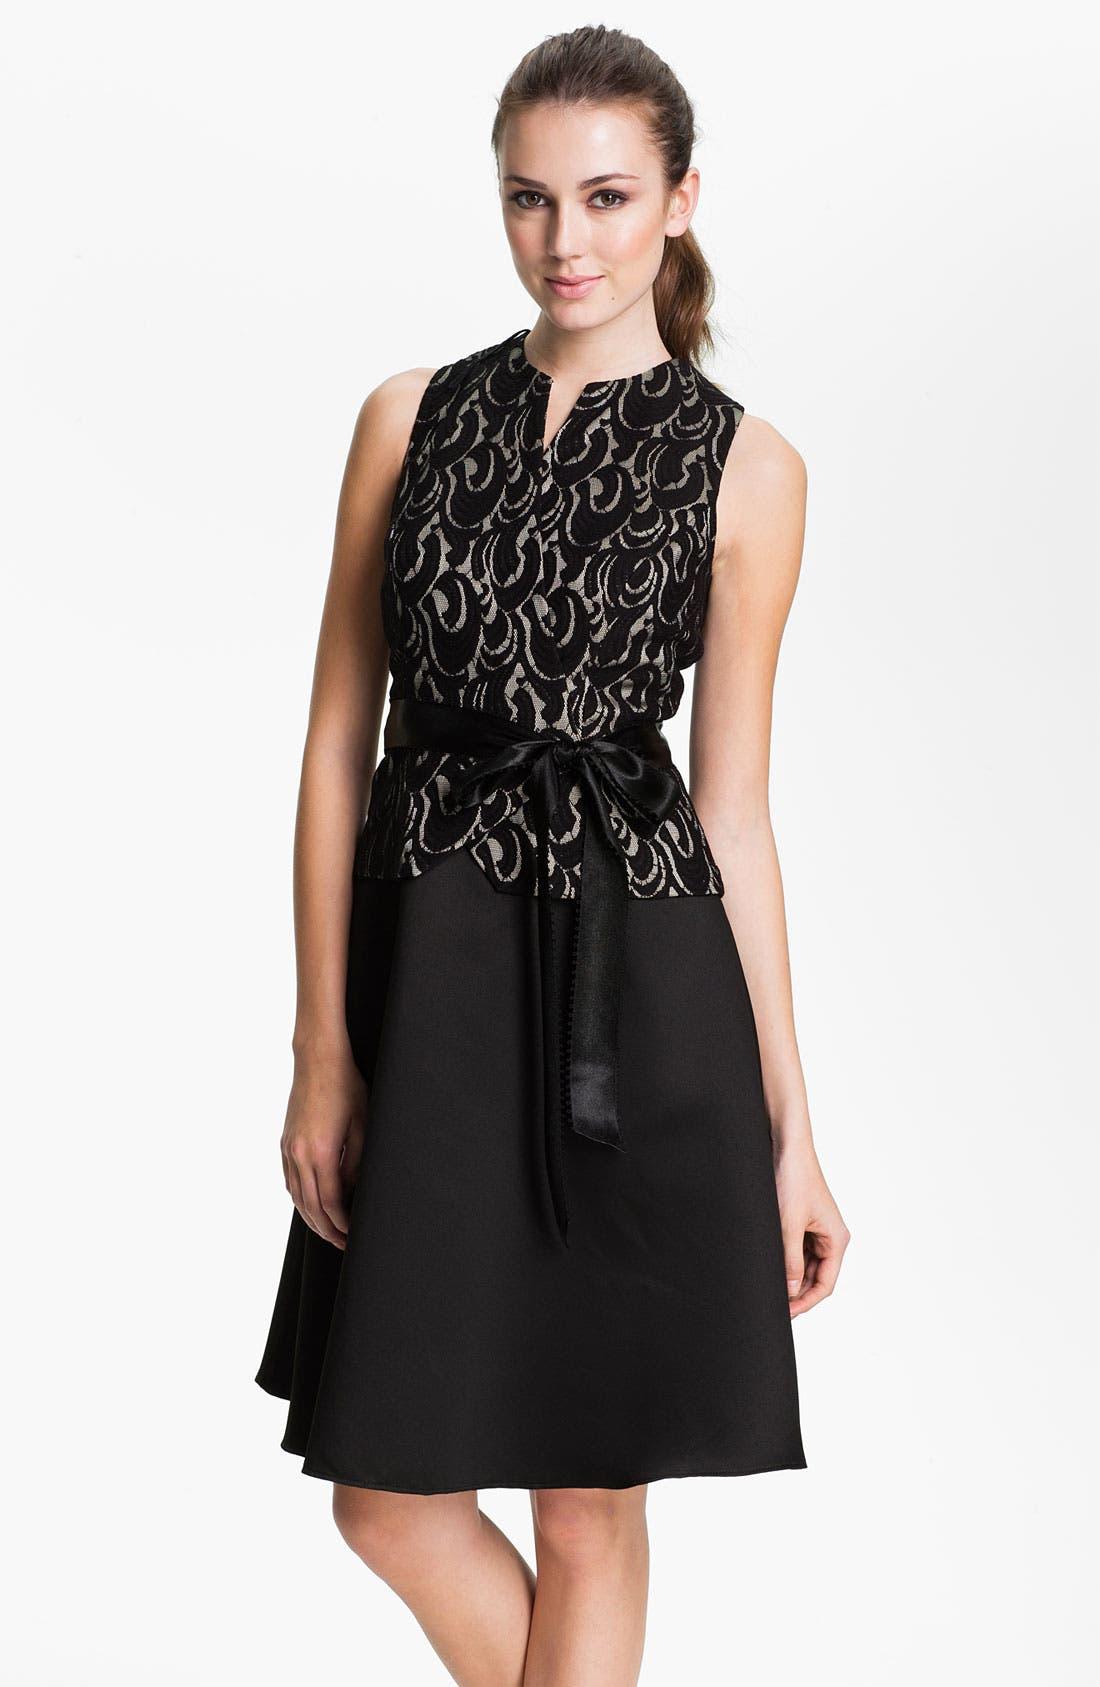 Alternate Image 1 Selected - Patra Lace Appliqué Satin Fit & Flare Dress